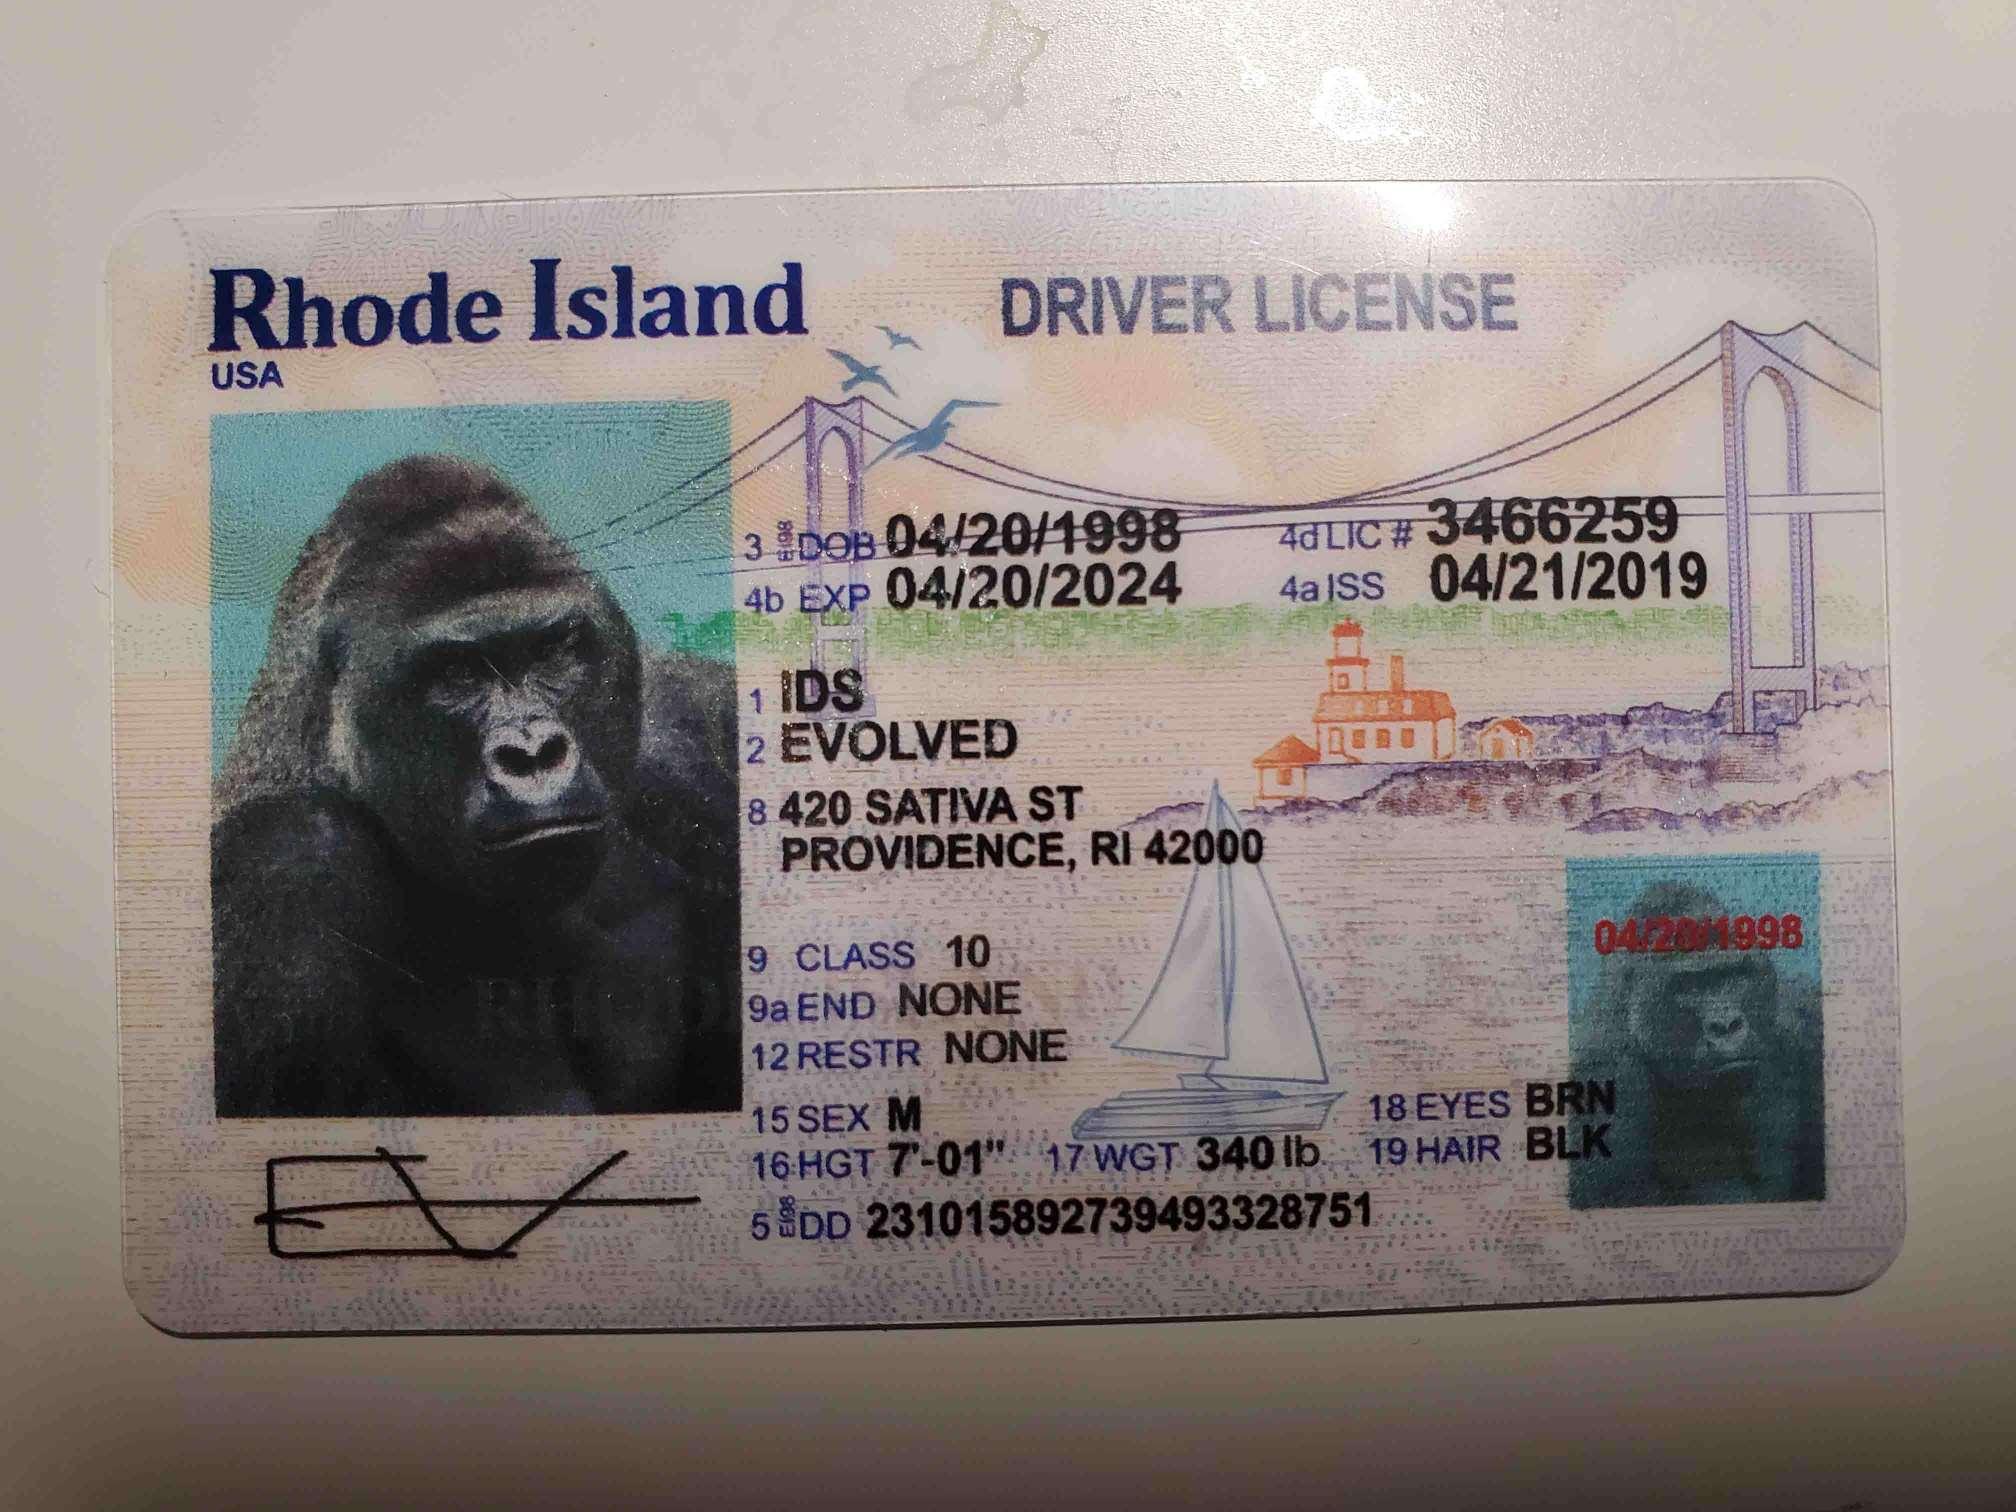 Rhode Island (New Version) Fake ID Front